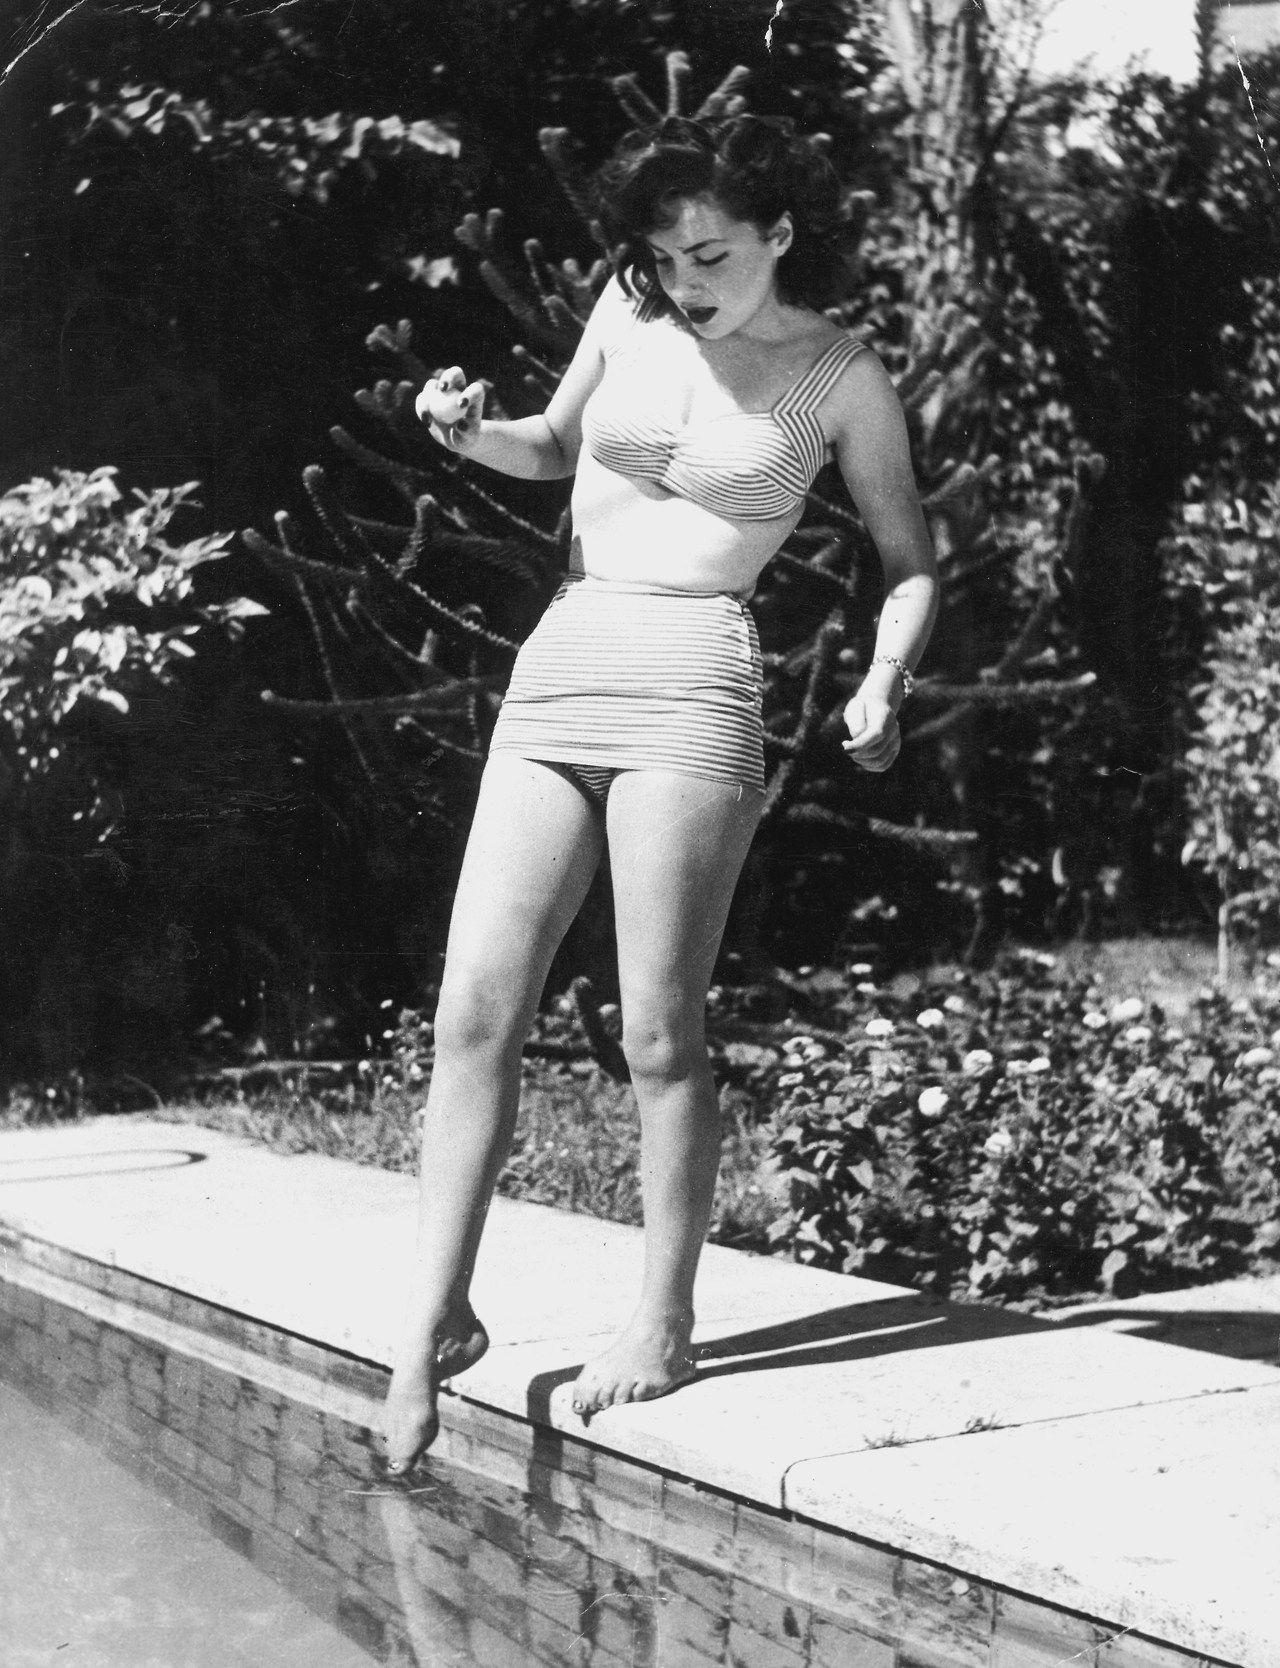 Gina Lollobrigida Young